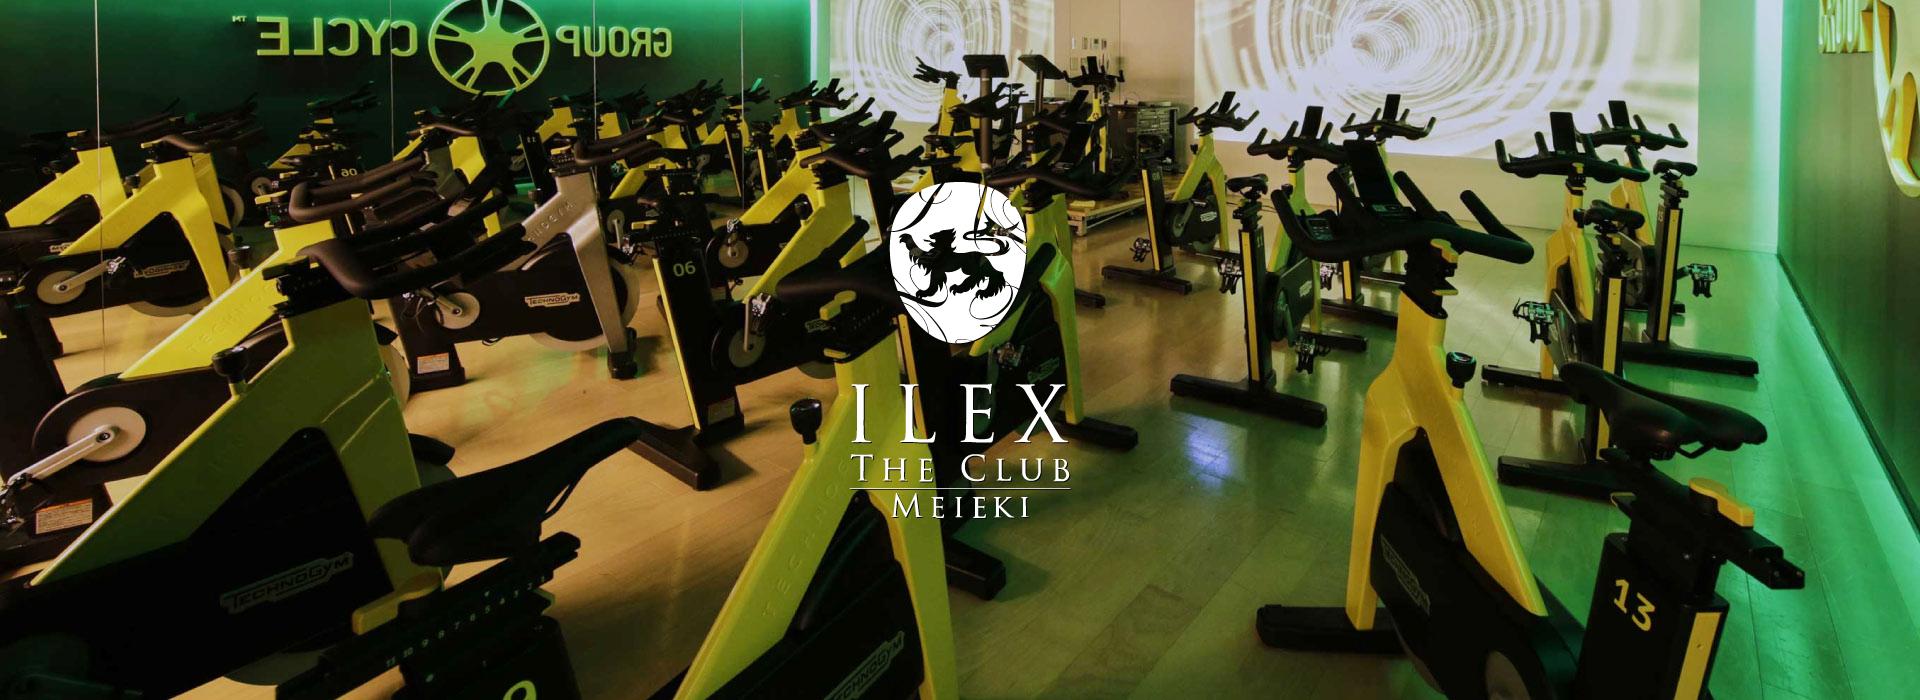 ILEX(アイレックス)の画像